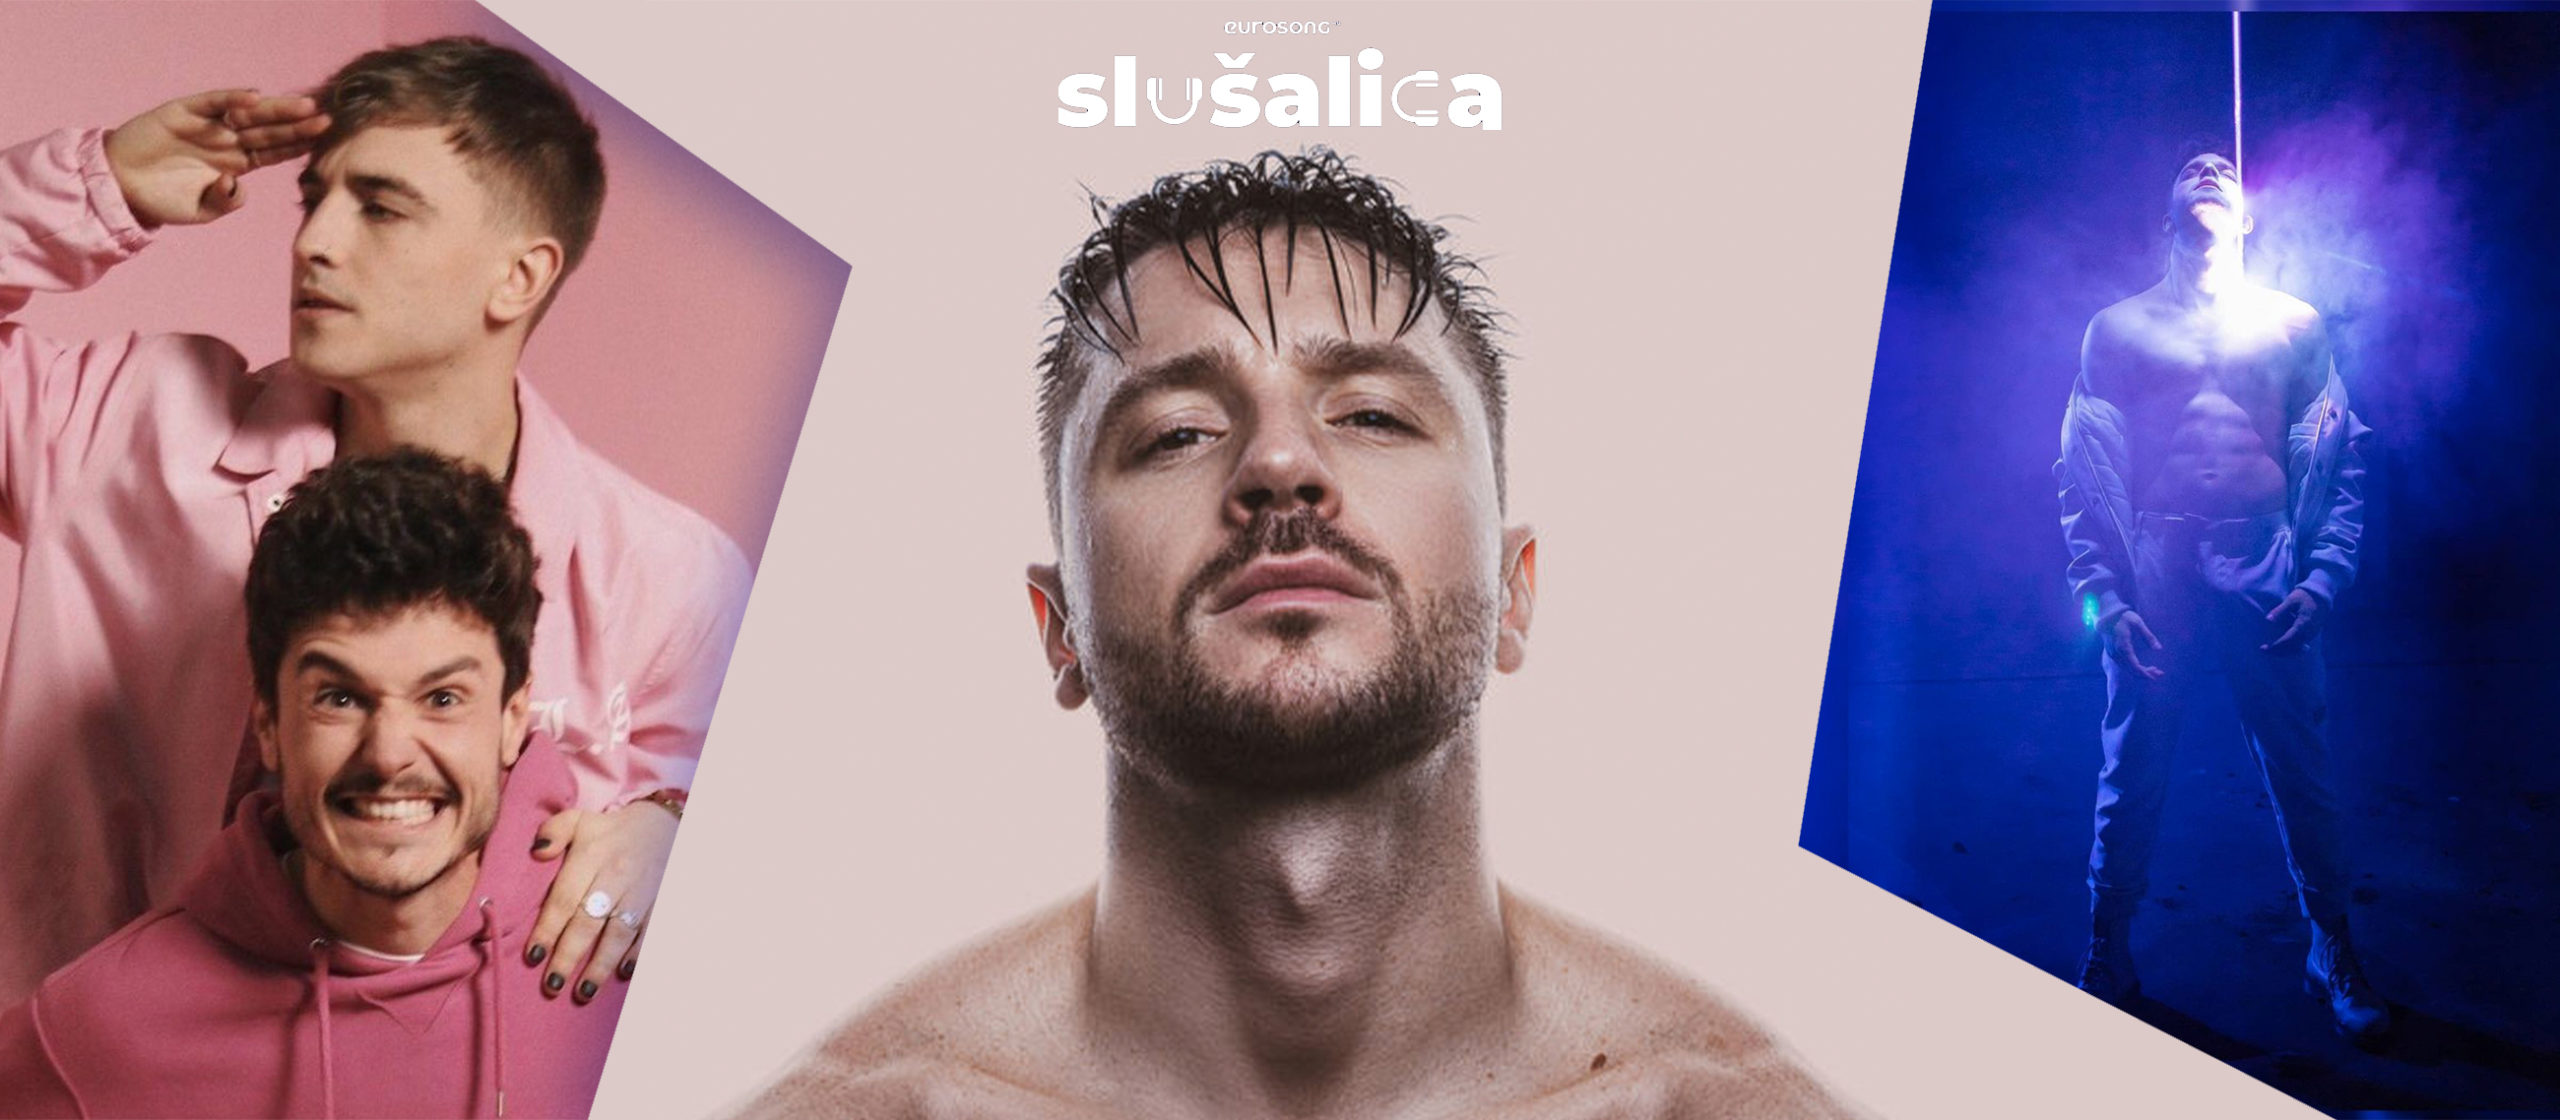 Eurosong Slušalica vizual za strani hit travnja/aprila 2021, Manel Navarro, Miki Nunez, Sergej Lazarev, Luca Hanni